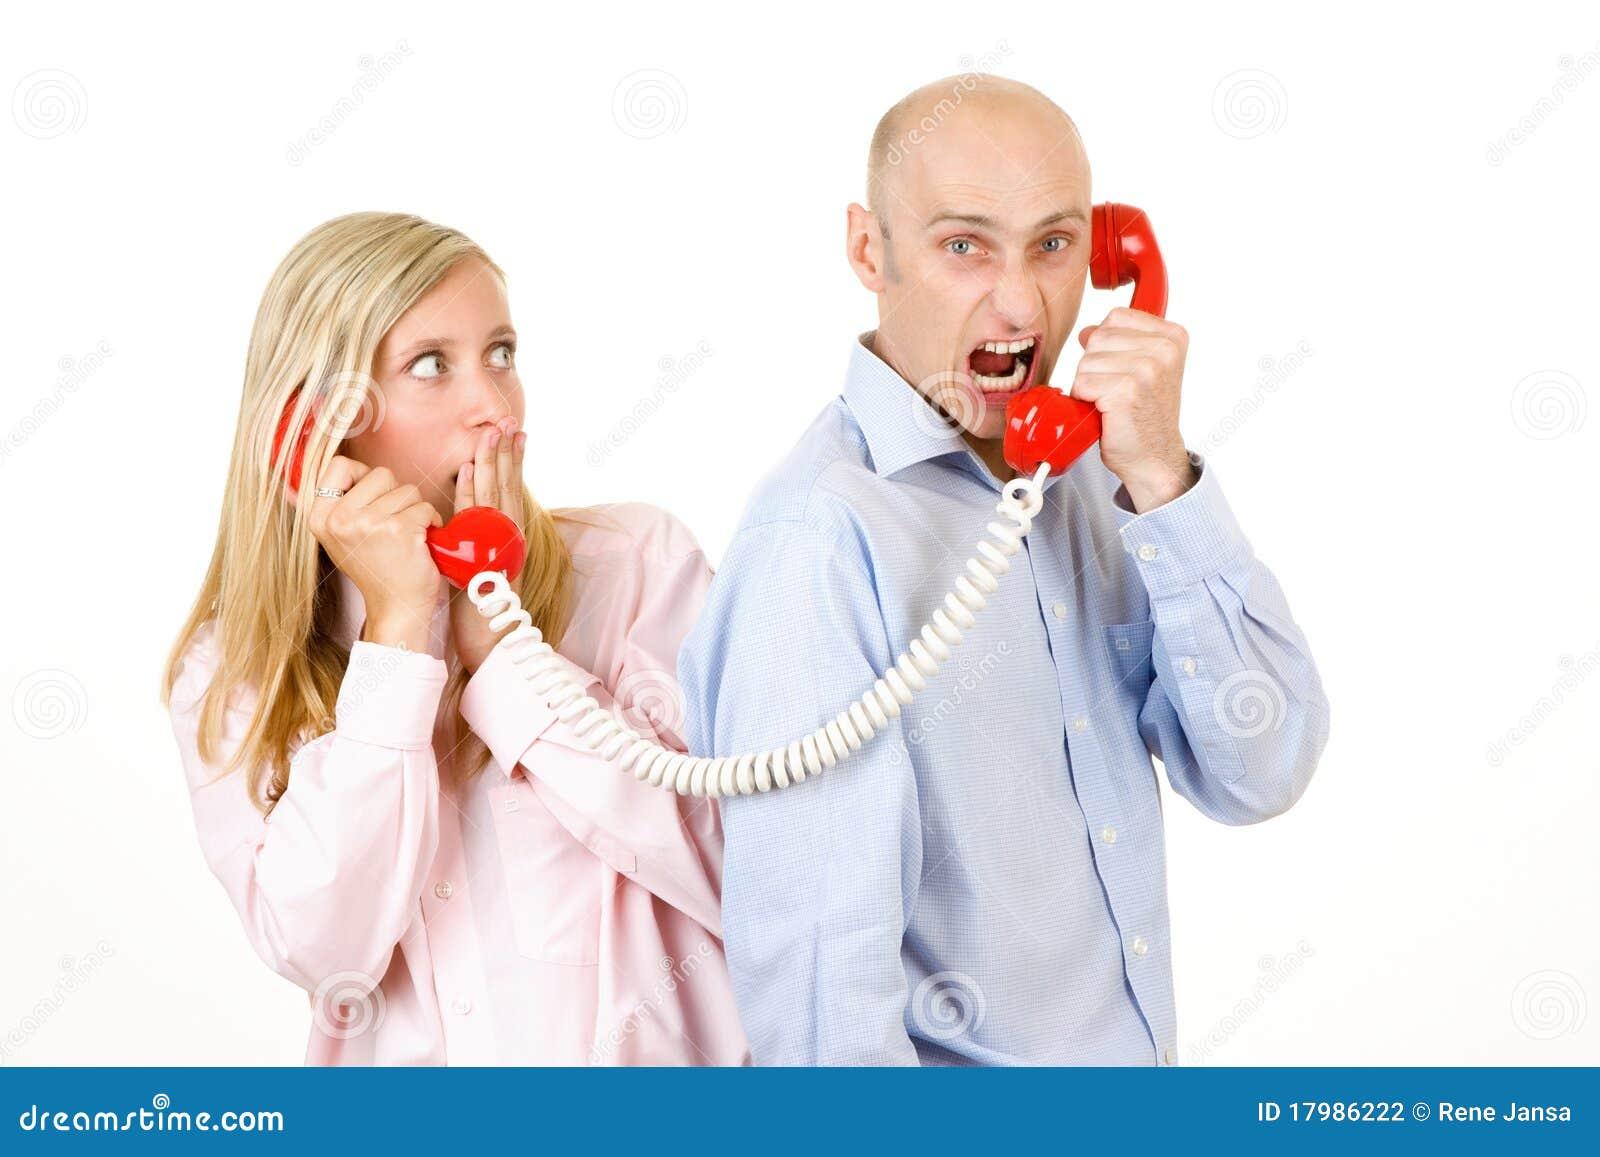 Man Yelling On Telephone Stock Photography